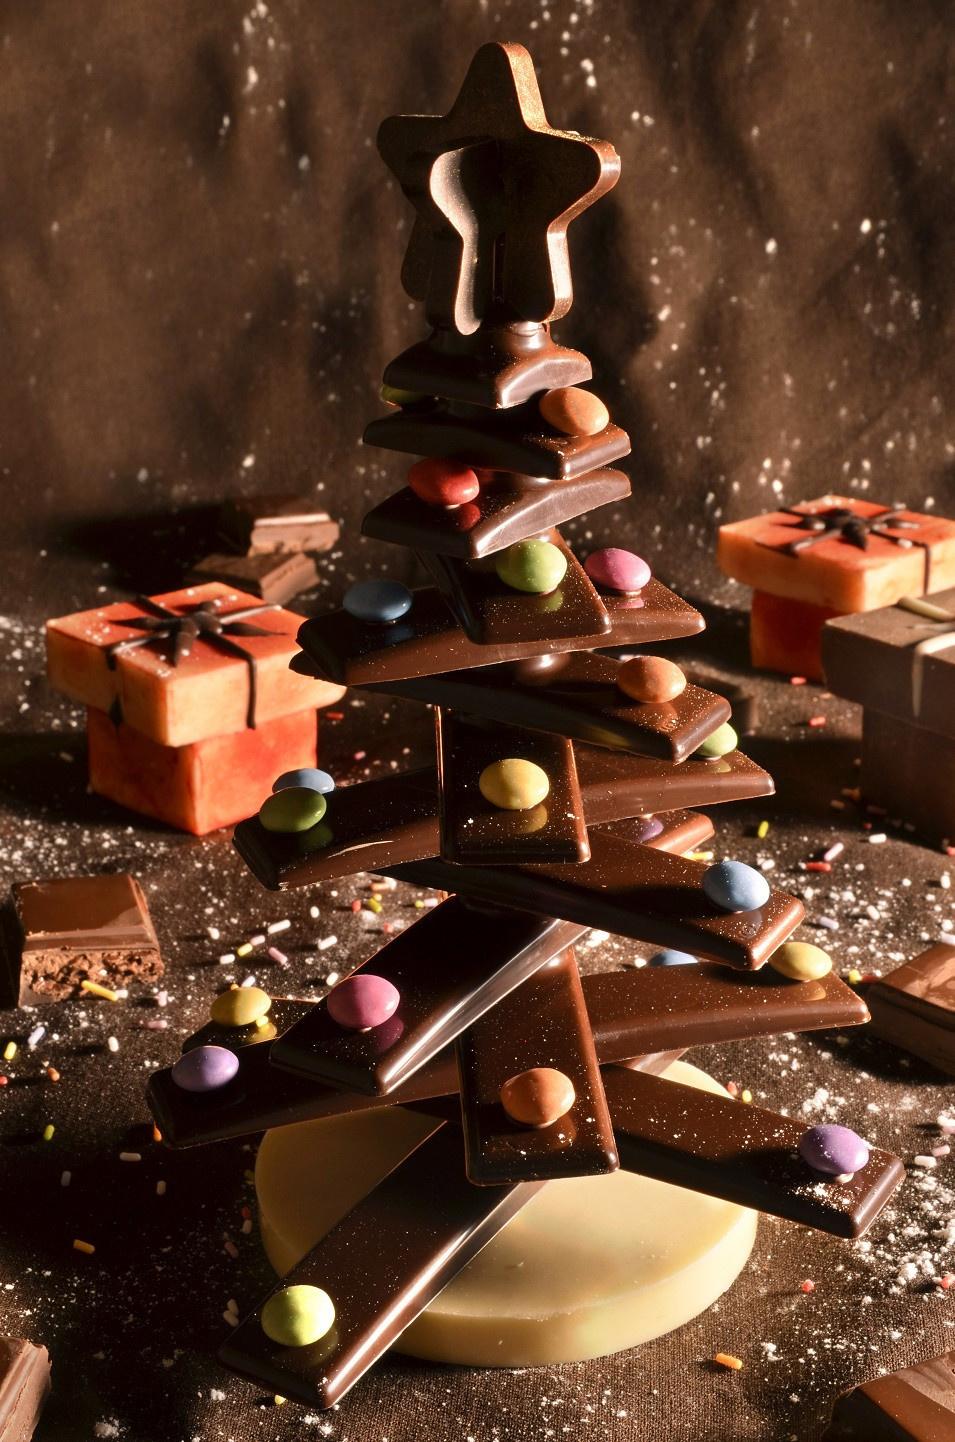 cr er son calendrier de l 39 avent au mus e gourmand du chocolat. Black Bedroom Furniture Sets. Home Design Ideas